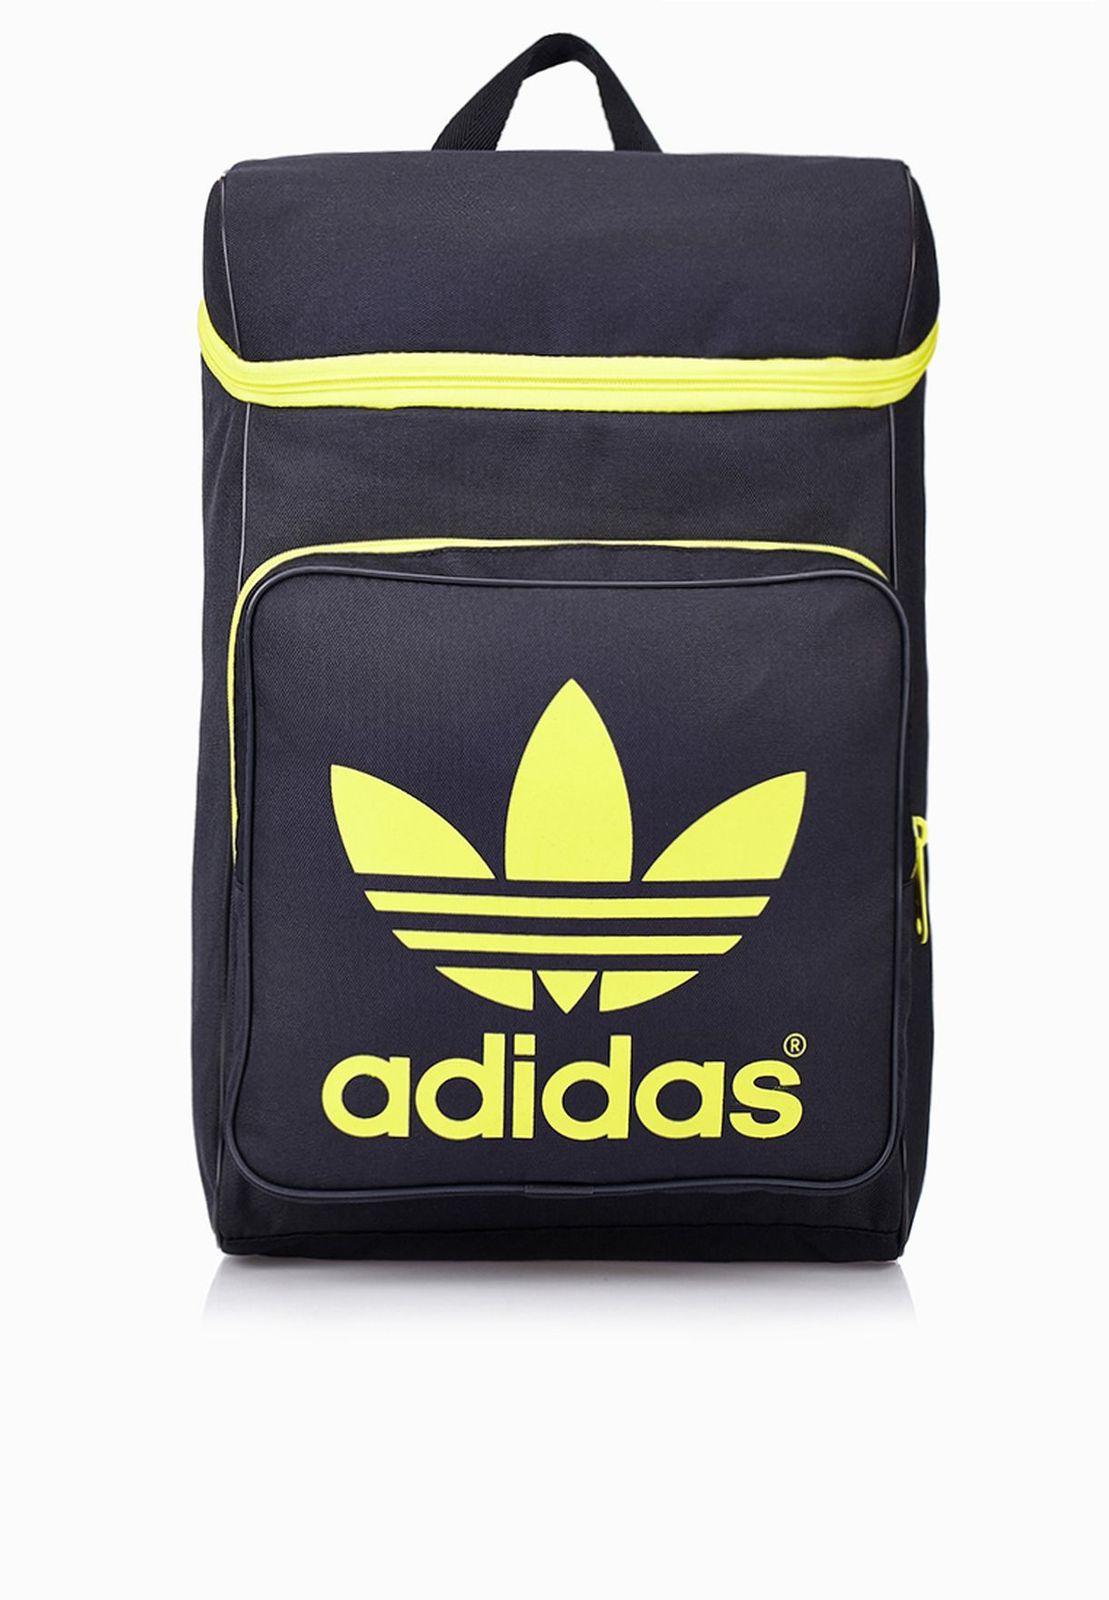 adf55075a2f80 adidas Originals Classic Trefoil Backpack Rucksack Freizeit Schule ...